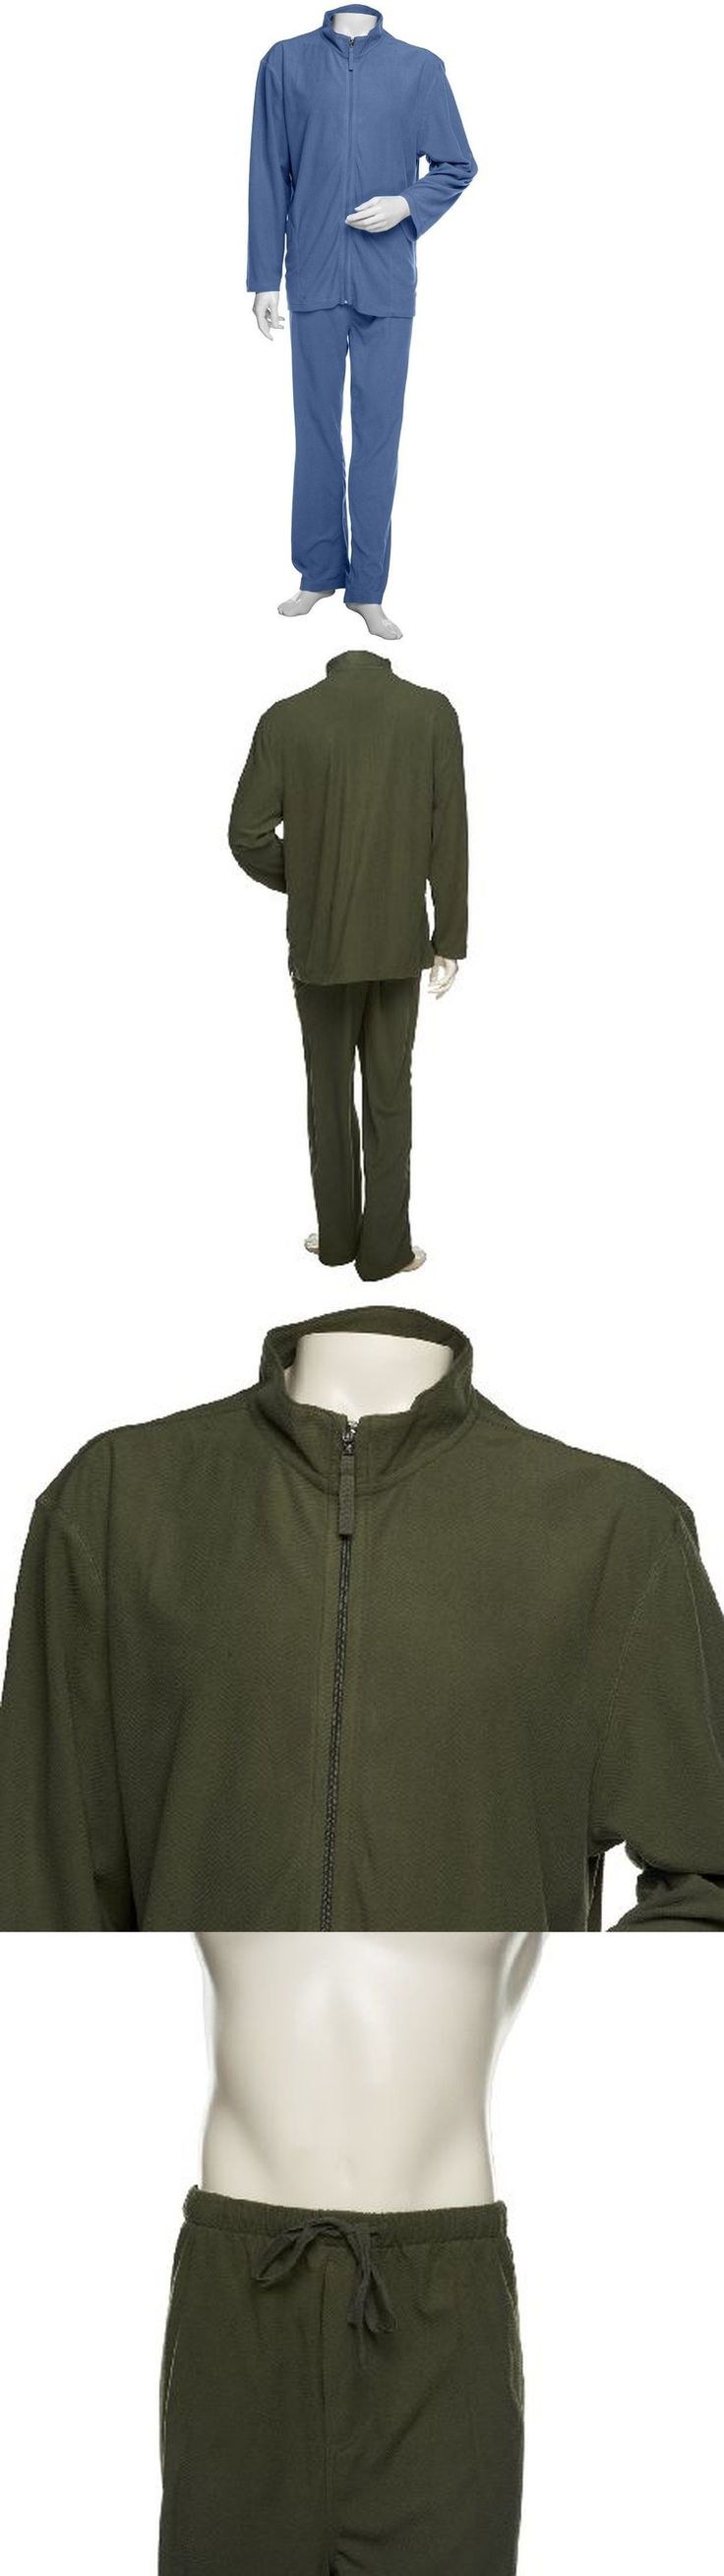 Sleepwear and Robes 11510: Stan Herman Elastic Waist Micro Fleece Mens Pajama Set Blue Xxl New A238015 -> BUY IT NOW ONLY: $31.97 on eBay!